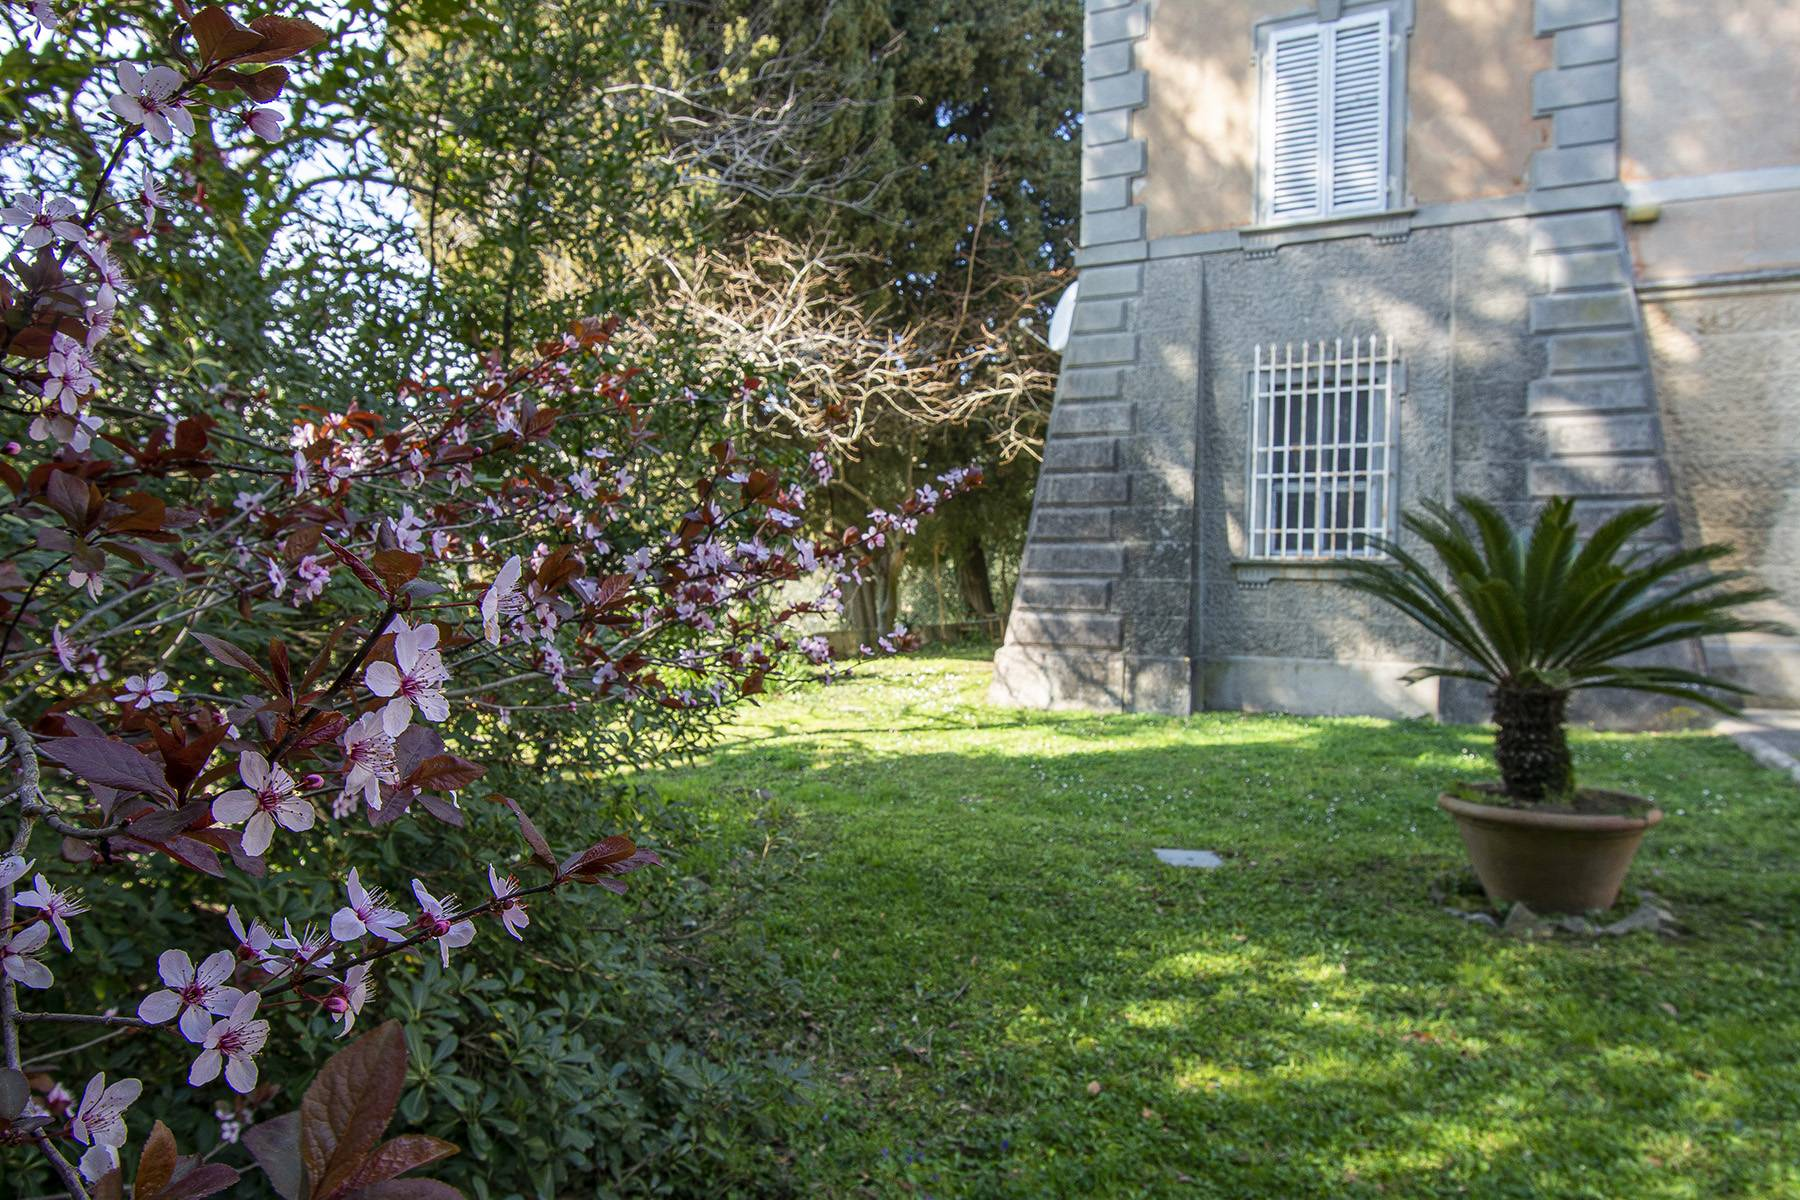 Romantic villa on the hills between Pisa and Lucca - 2